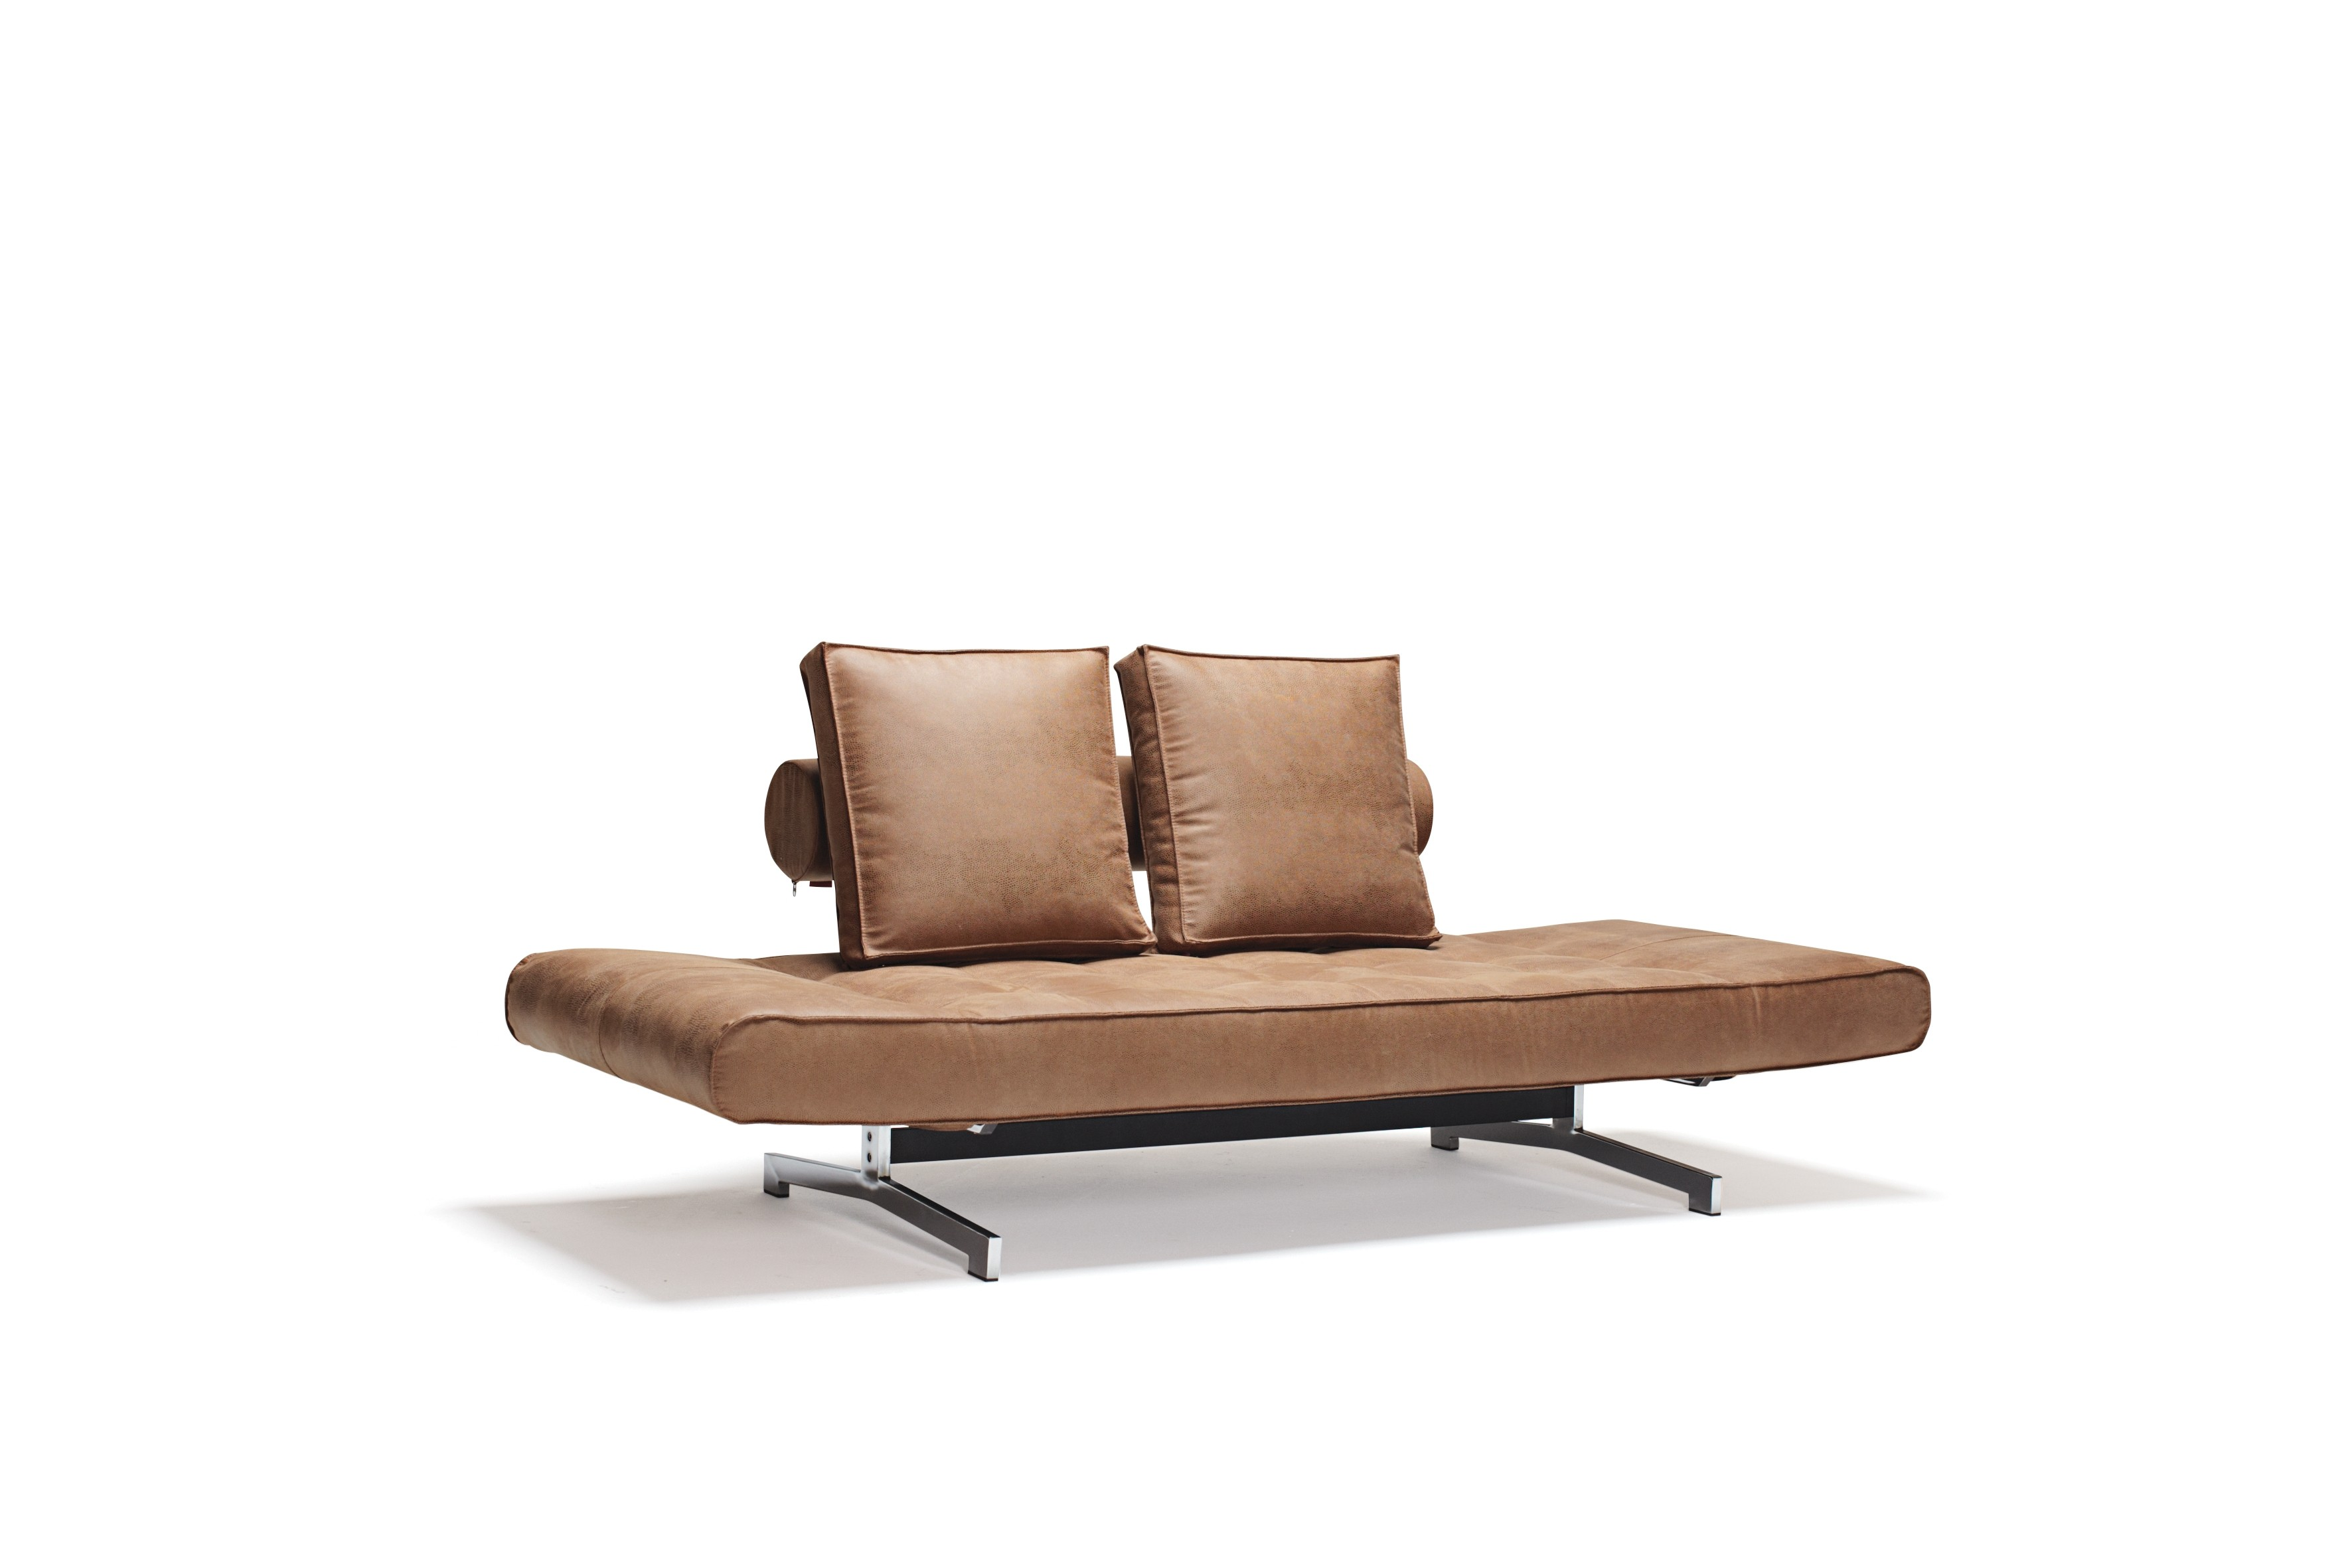 Ghia Chrom, daybed med stålben. 80 x 210 cm. 3 farver.-20